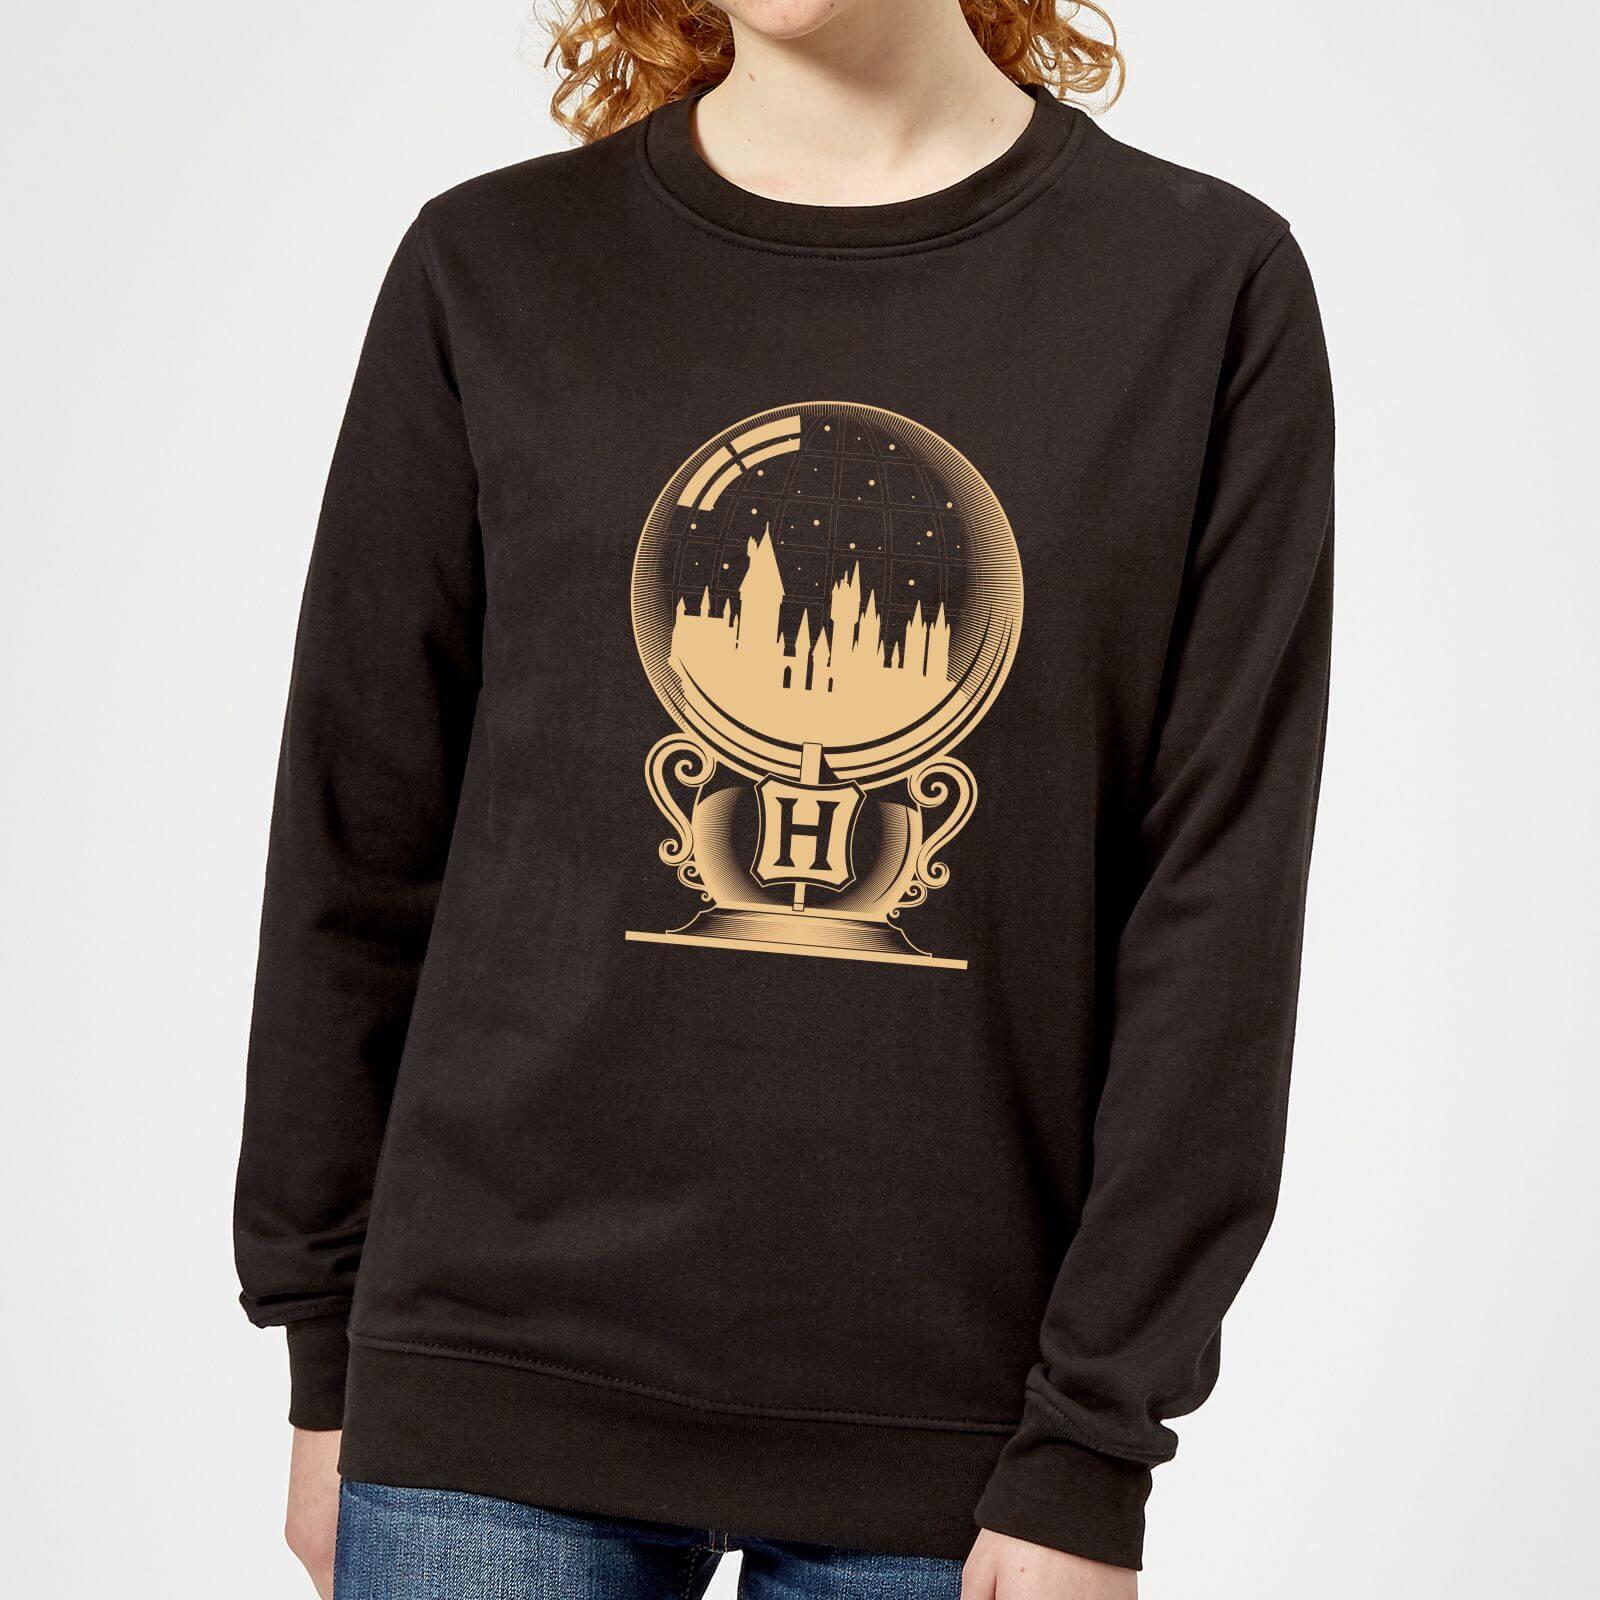 a5879e762 Harry Potter Hogwarts Snowglobe Women's Sweatshirt - Black Clothing   Zavvi